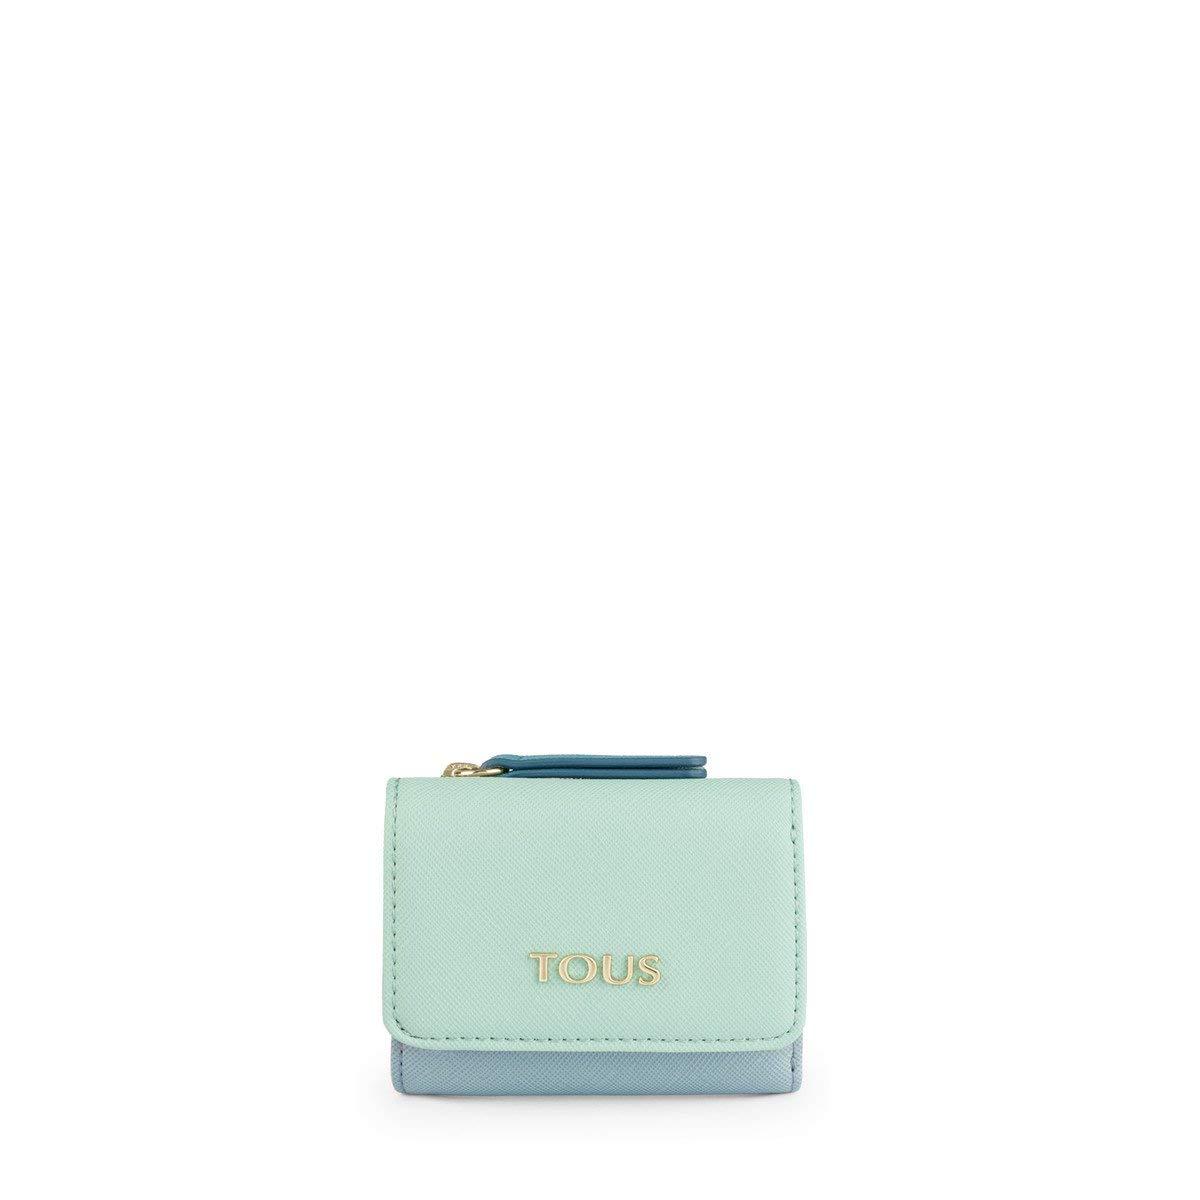 Tous Monedero S. Solapa Essence Azul-Turquesa, Mujer, 9x8x3 cm (W x H x L)